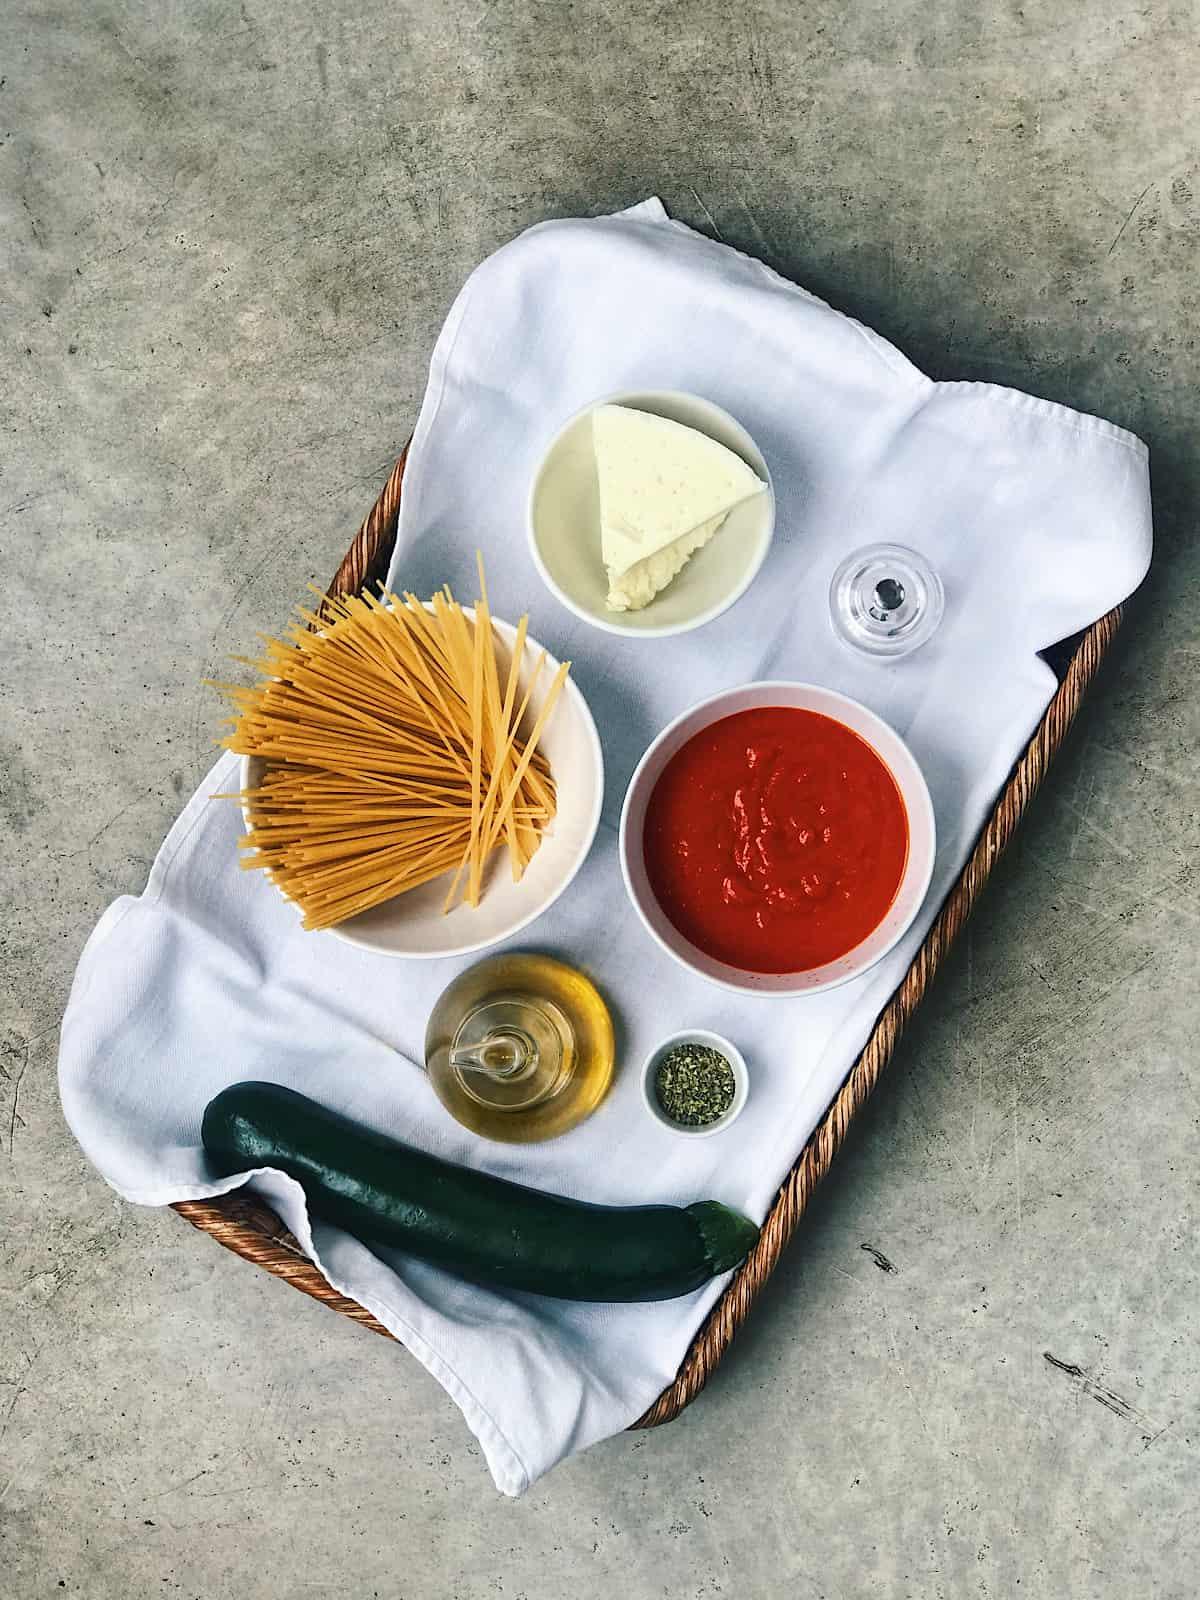 Ingredientes de espaguetis con calabacin